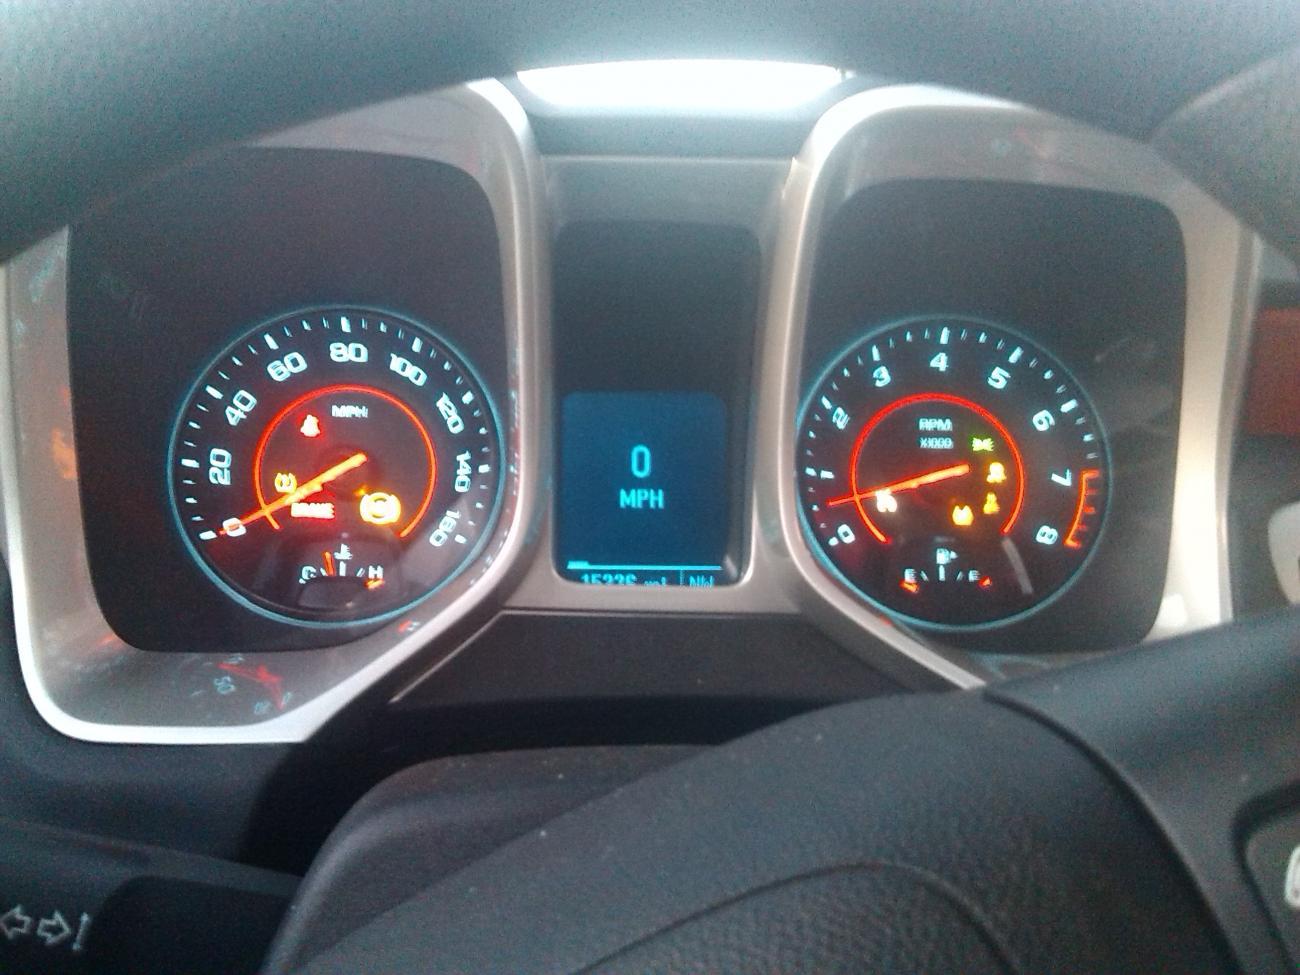 Every Light But Check Engine Light Is On Dash Camaro5